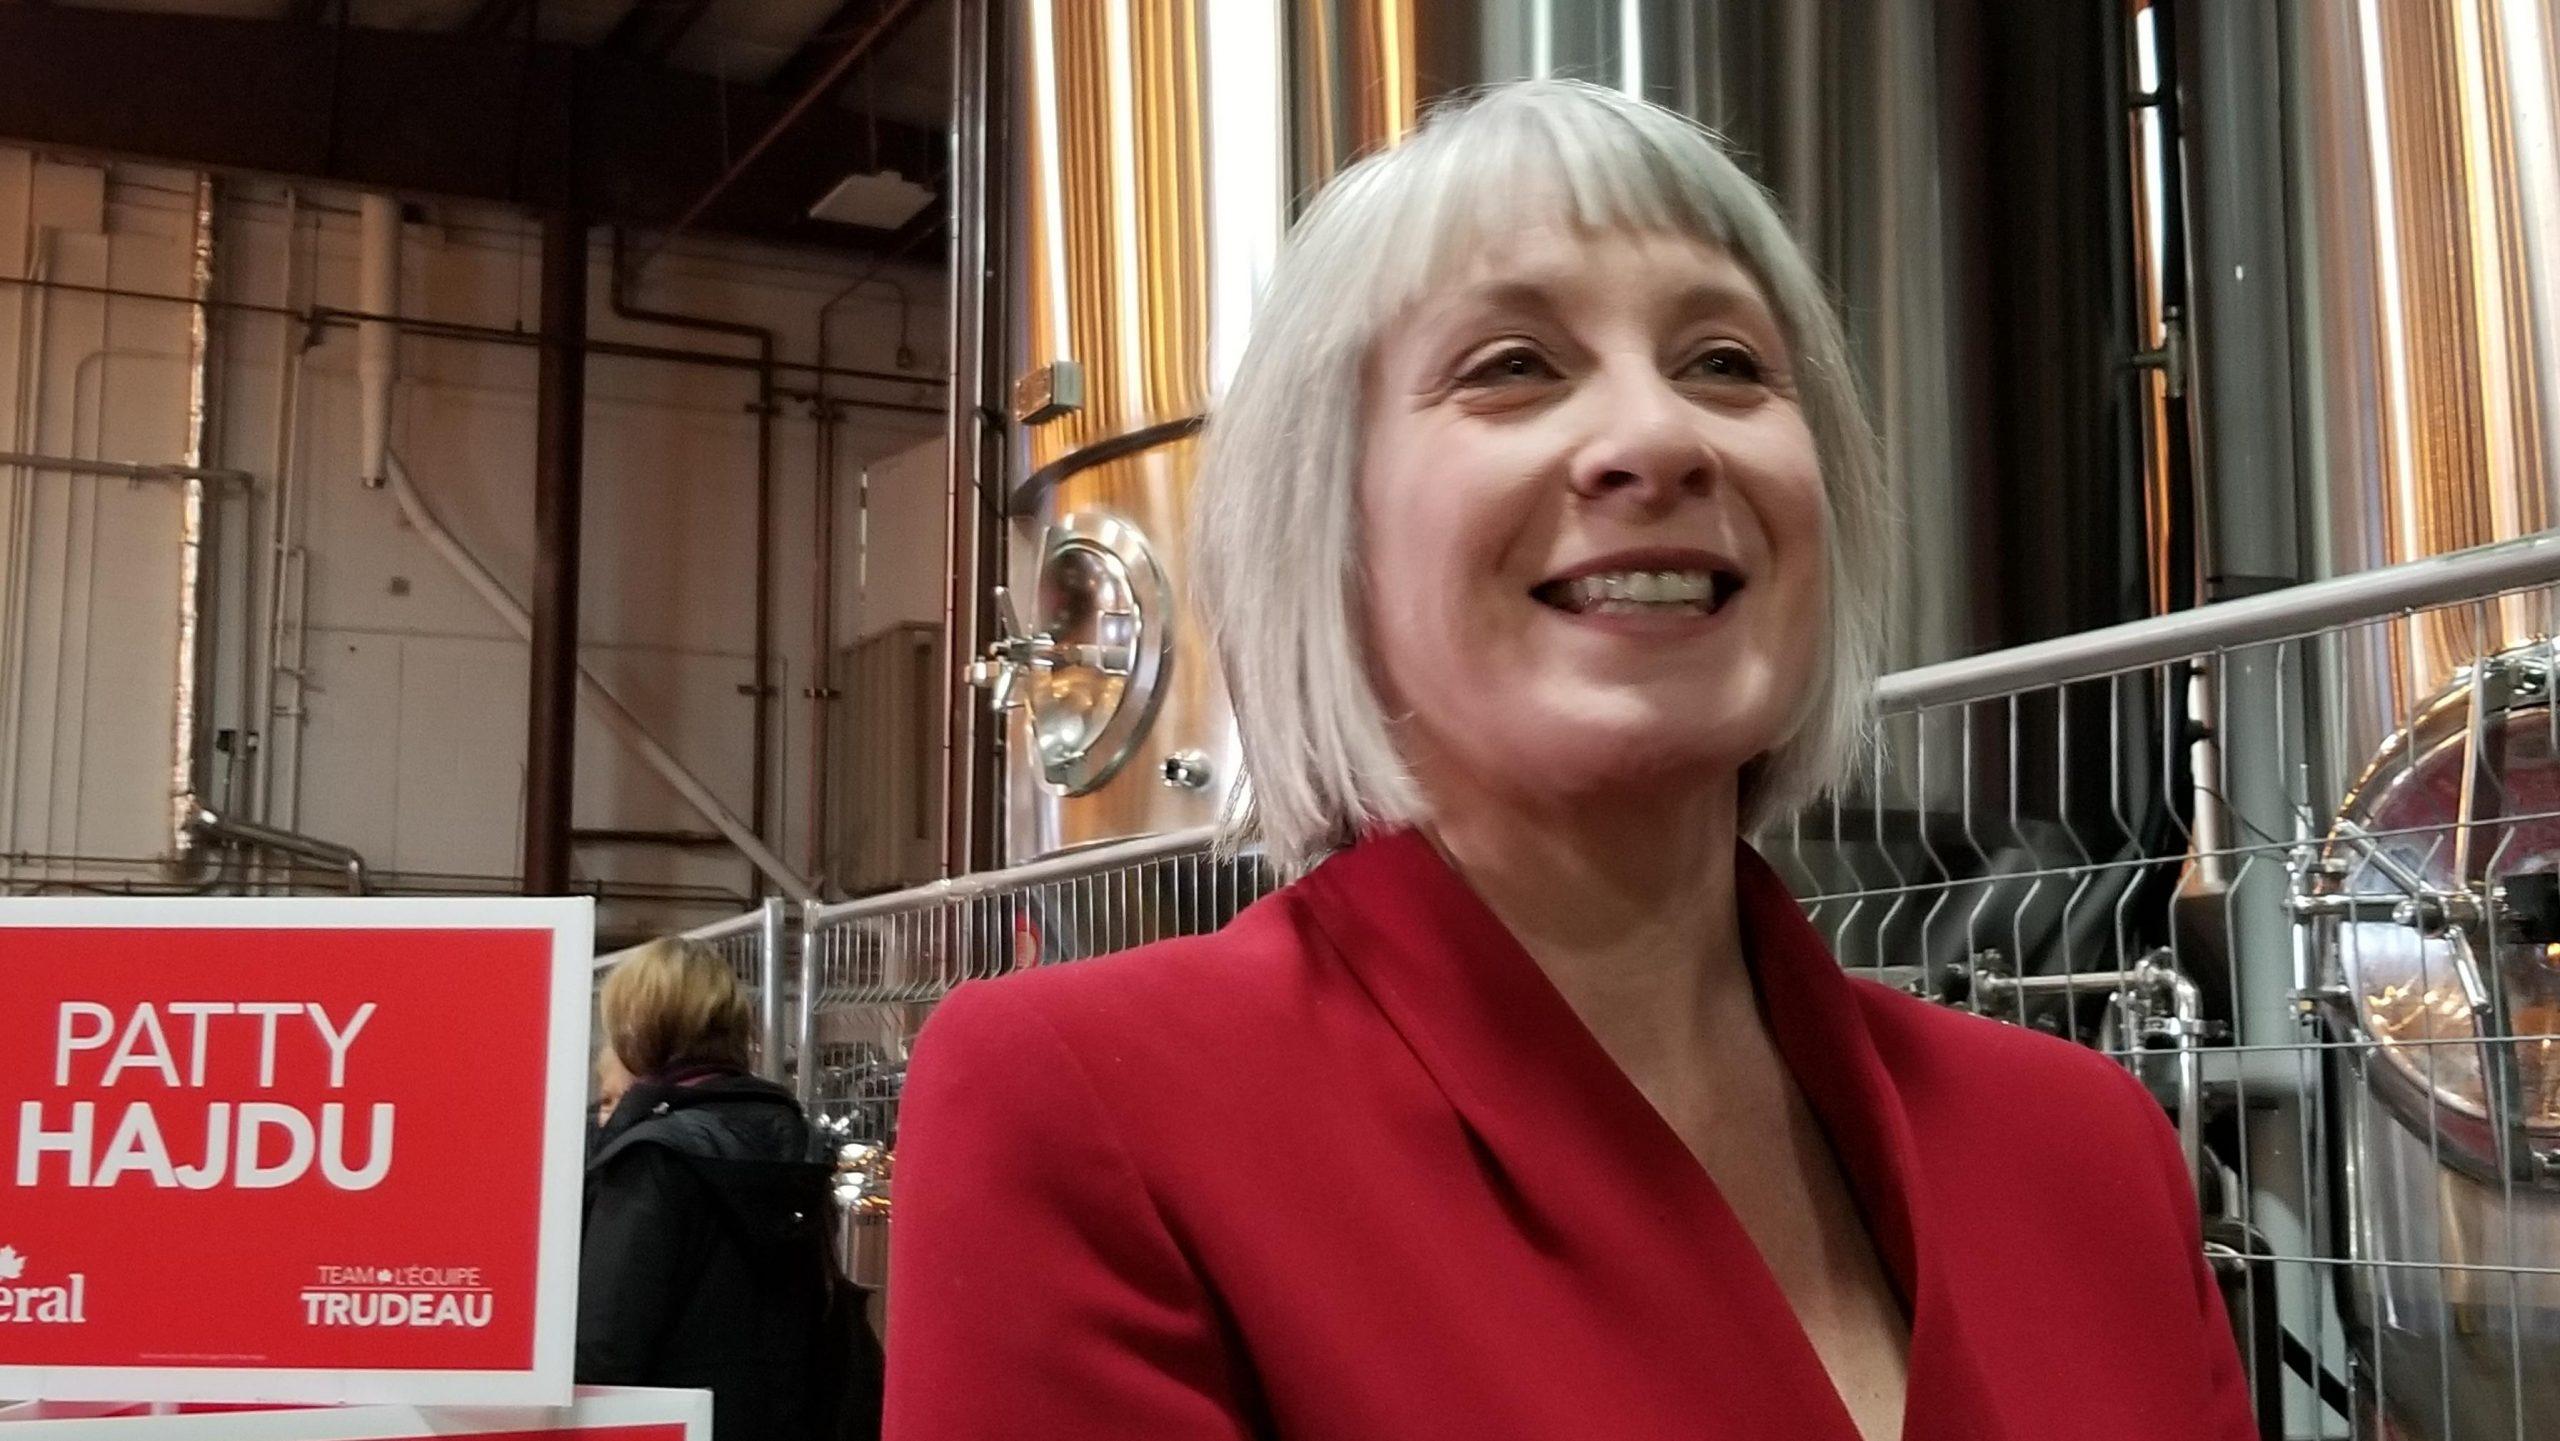 Hajdu Confirmed As Liberal Candidate